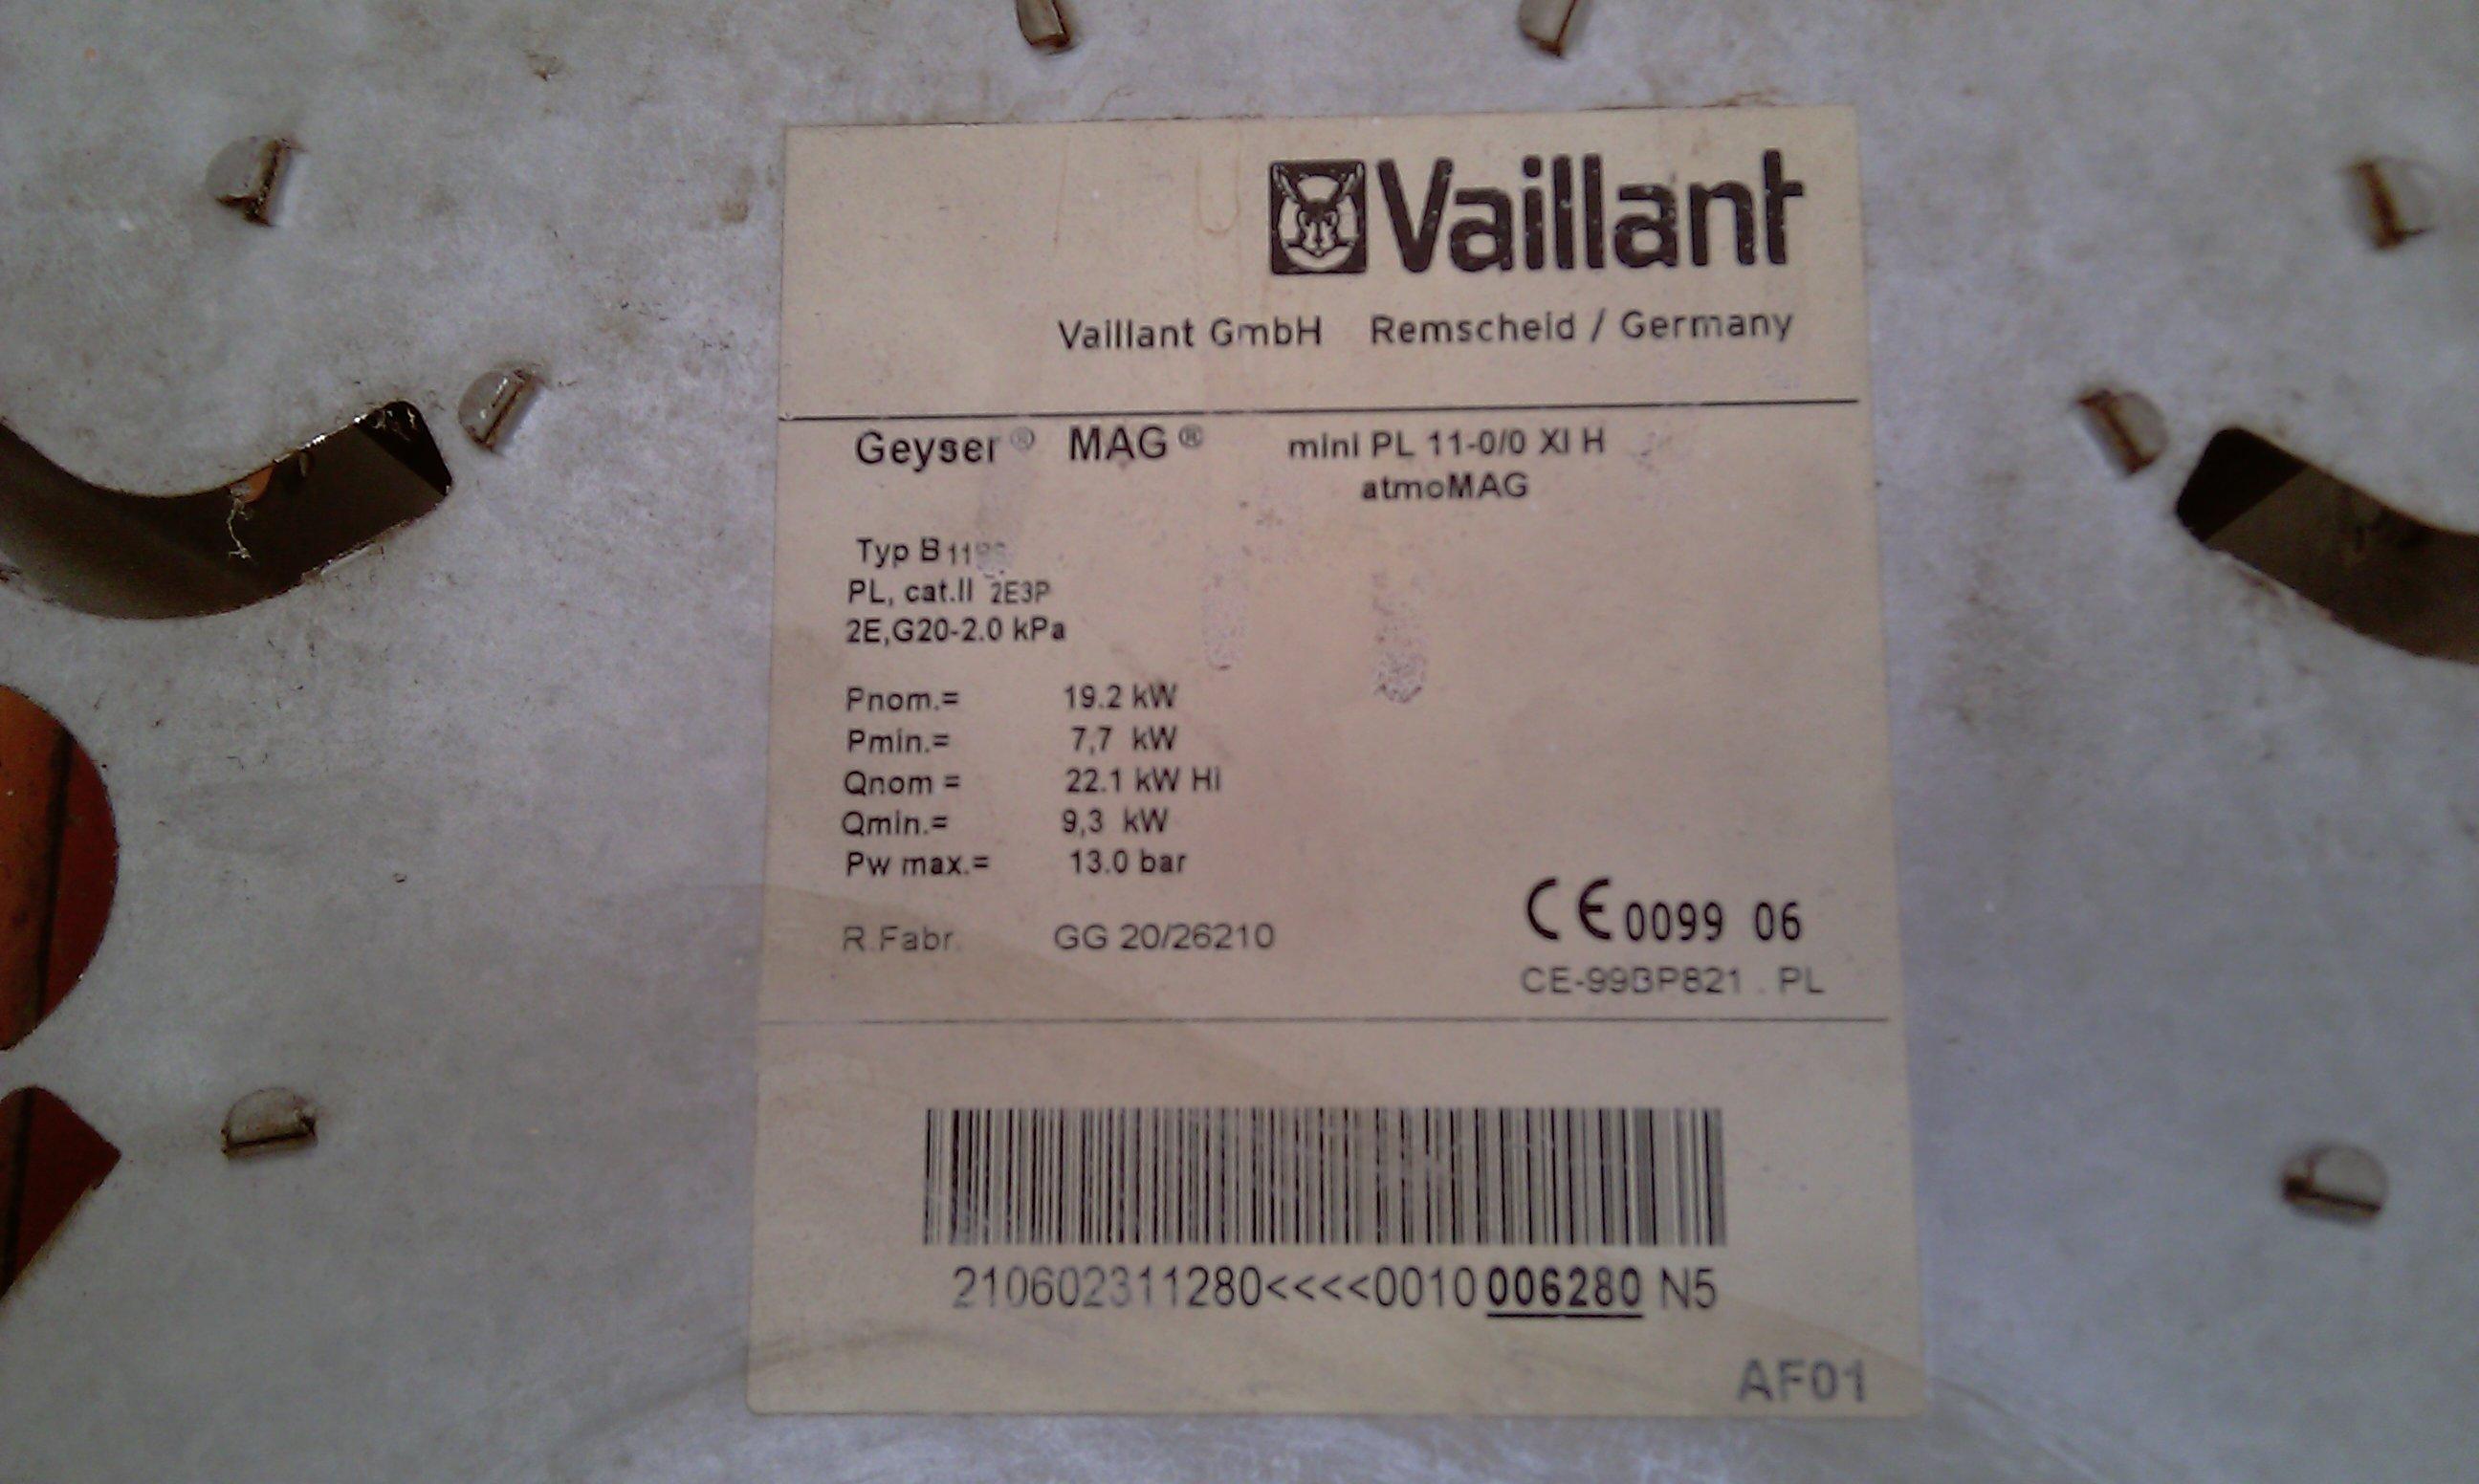 Vaillant atmoMAG 11-0/0 XI H - Jak wyregulowa� membran�